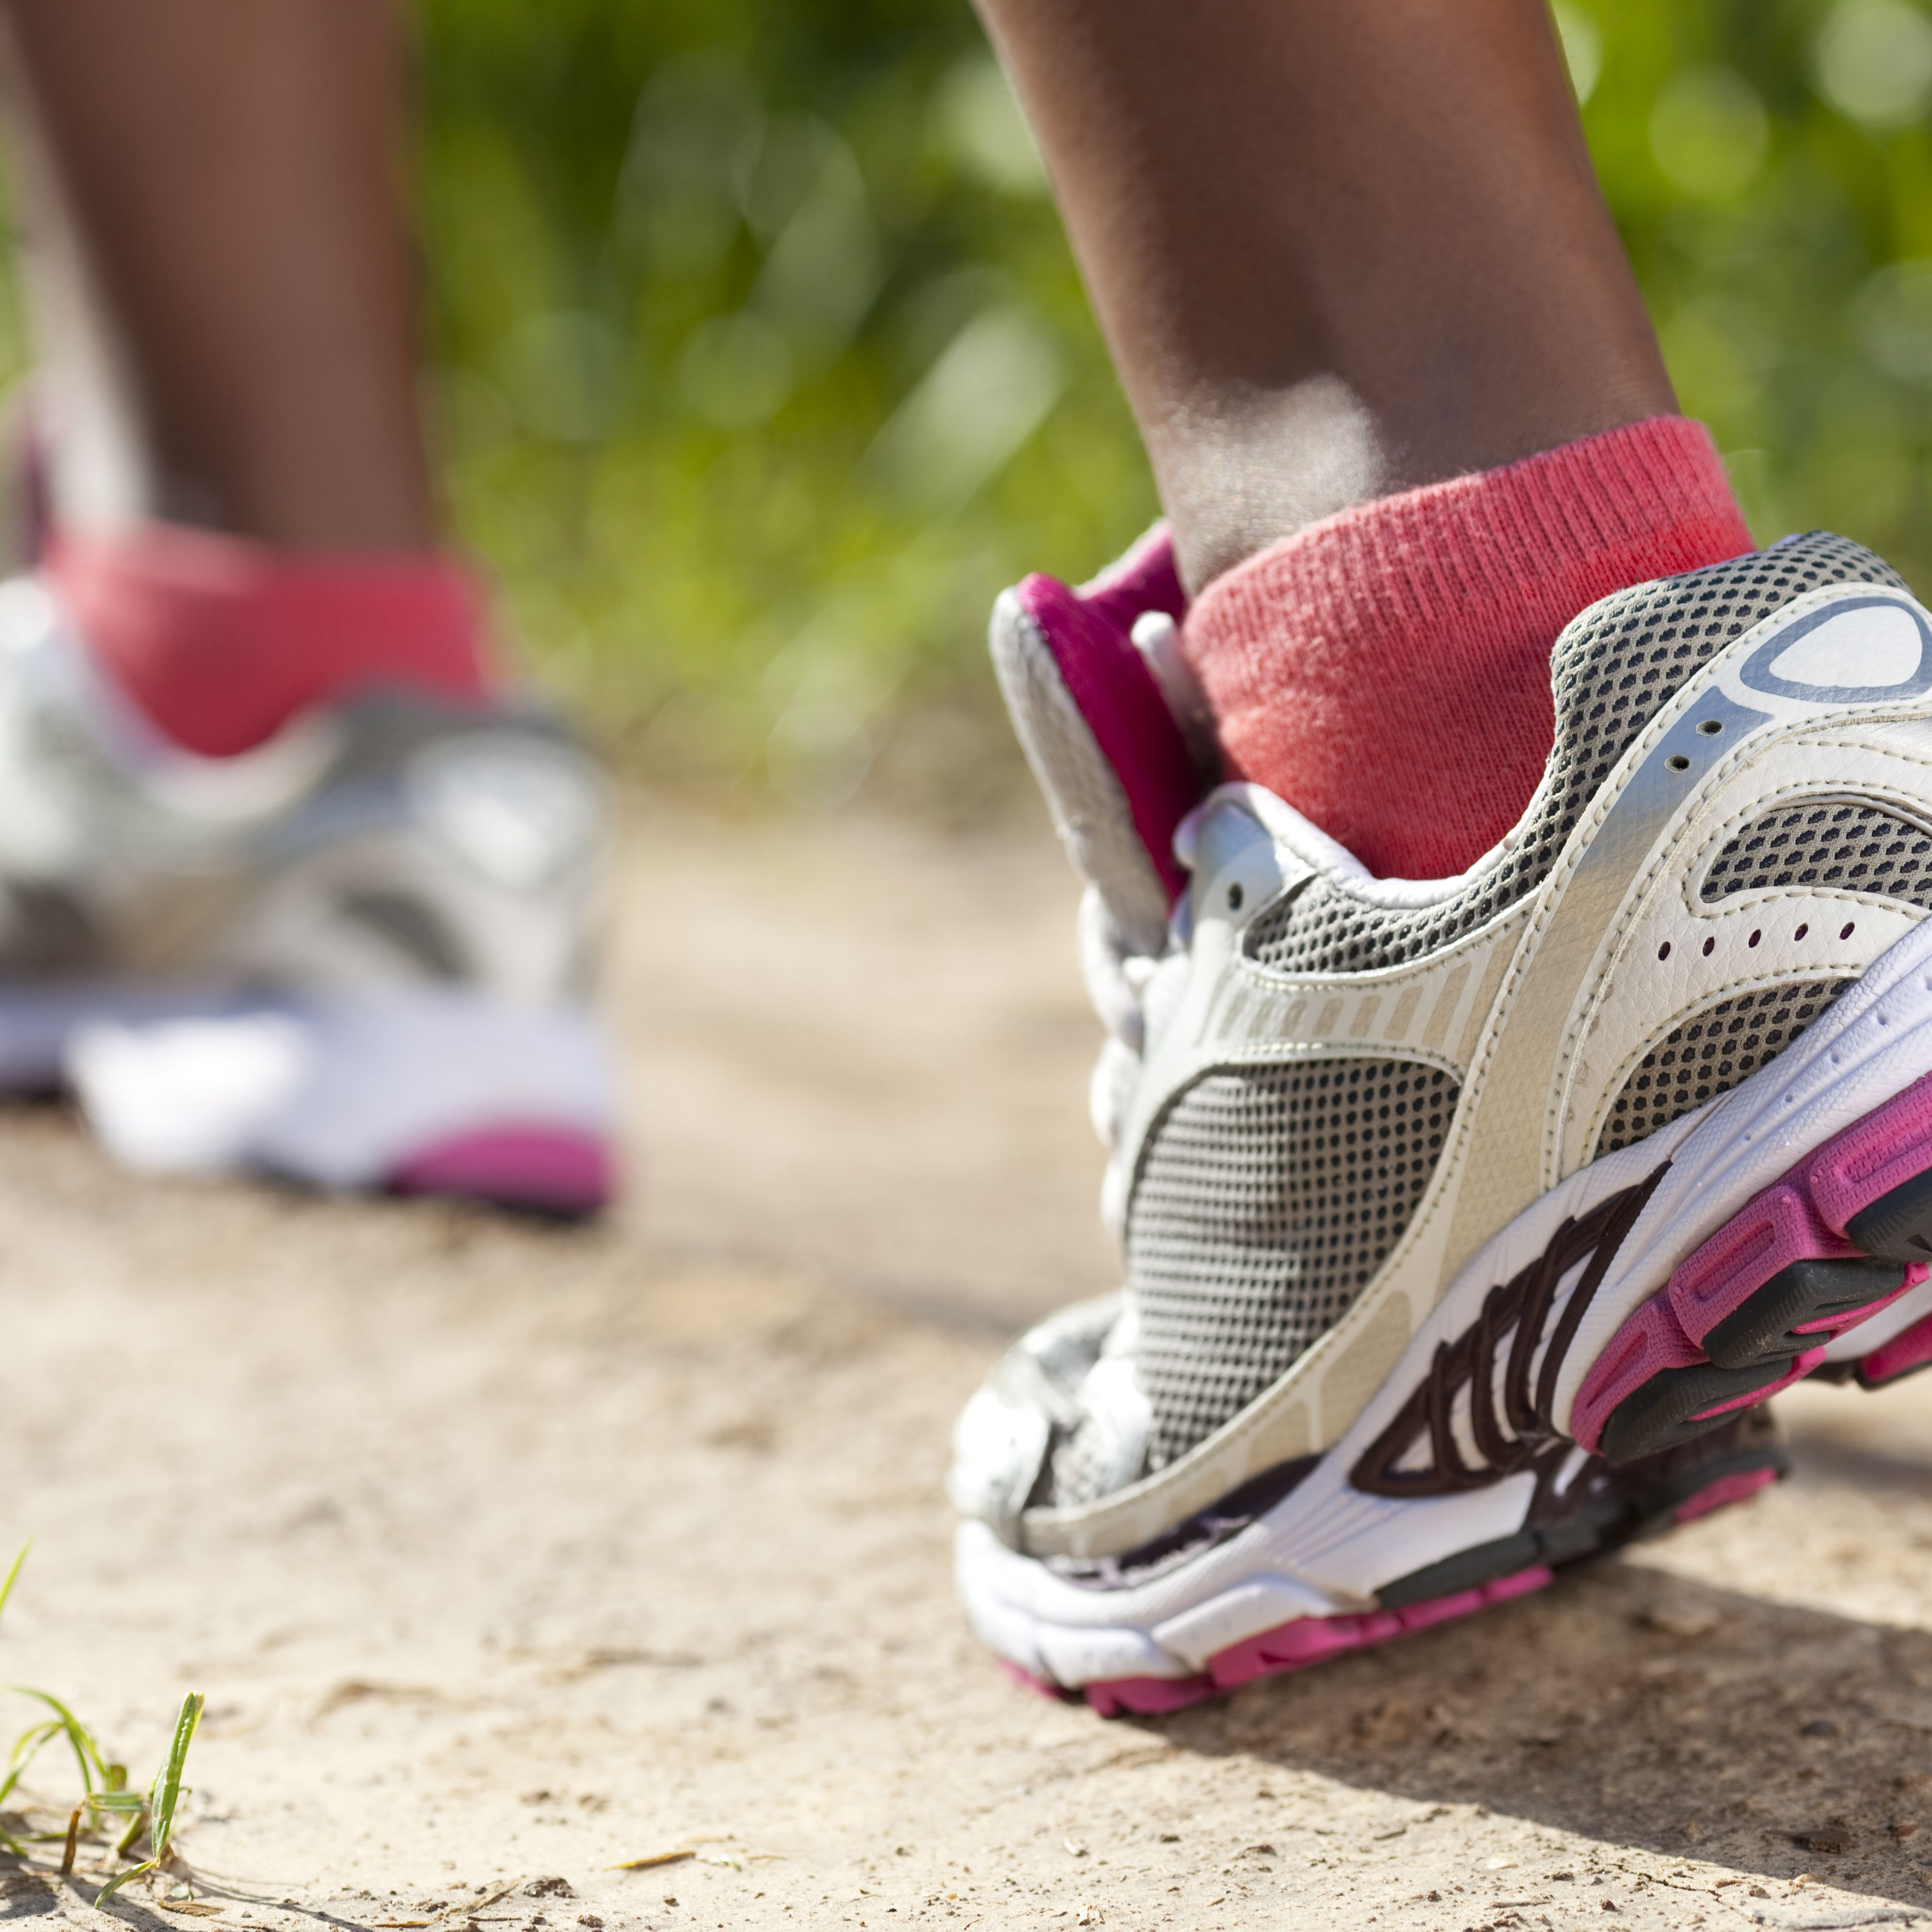 f13ded86e6 The 10 Best Walking Socks of 2019